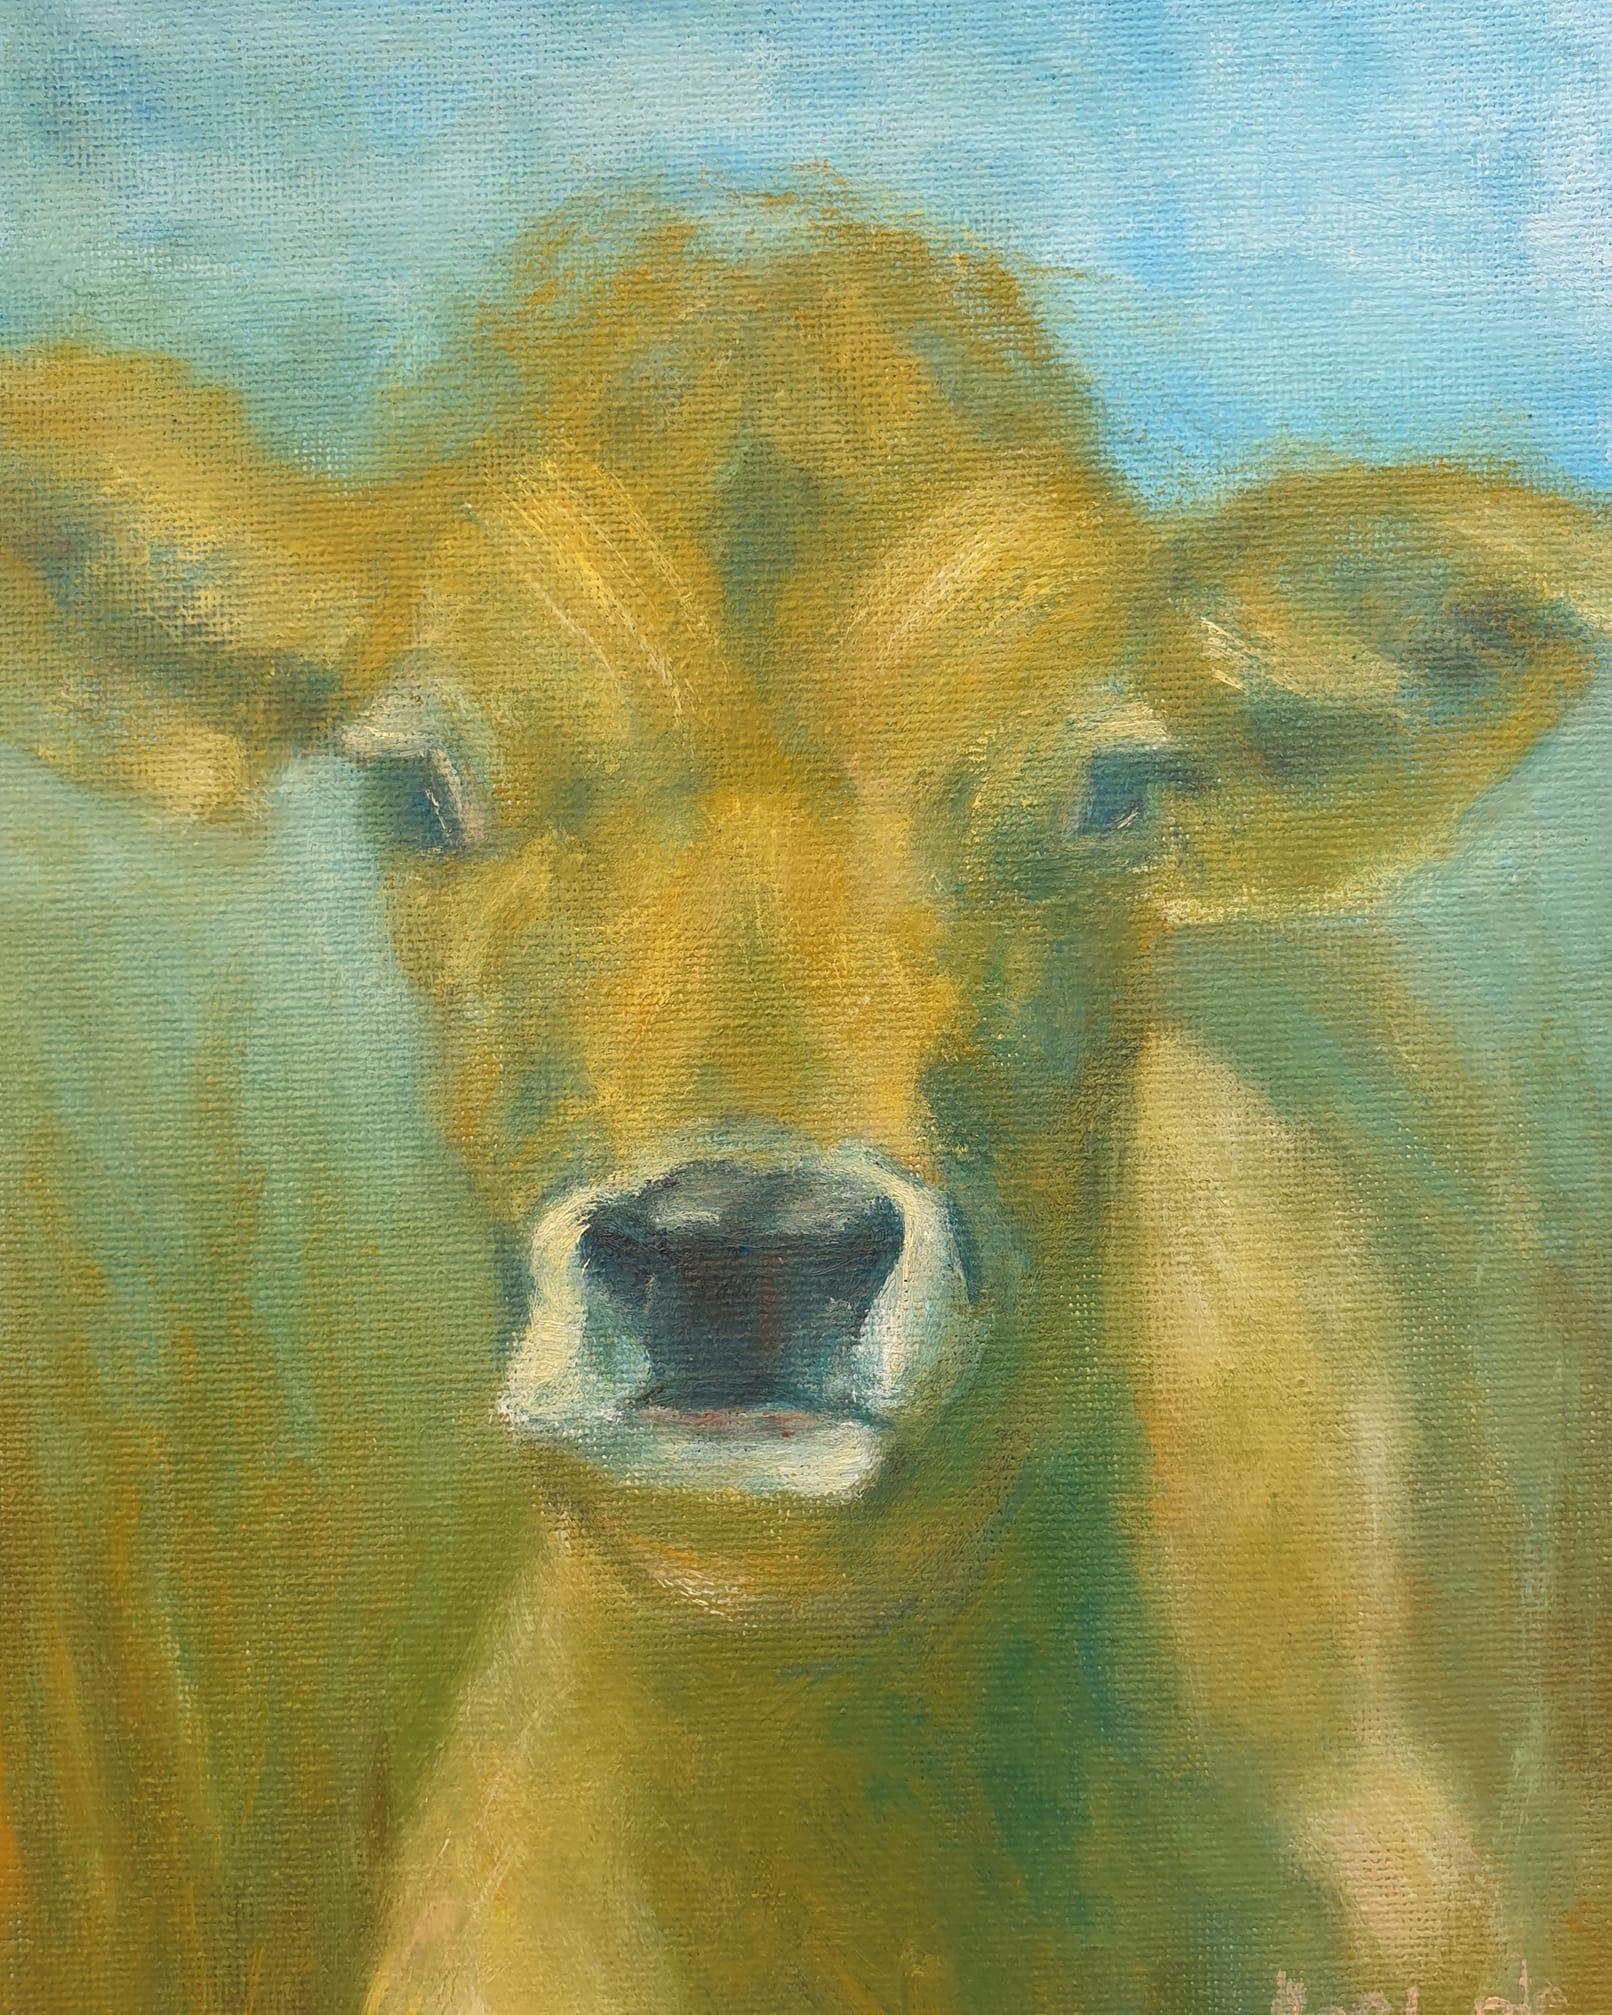 Sonia L'eatarde, Golden Calf, oil on canvas,